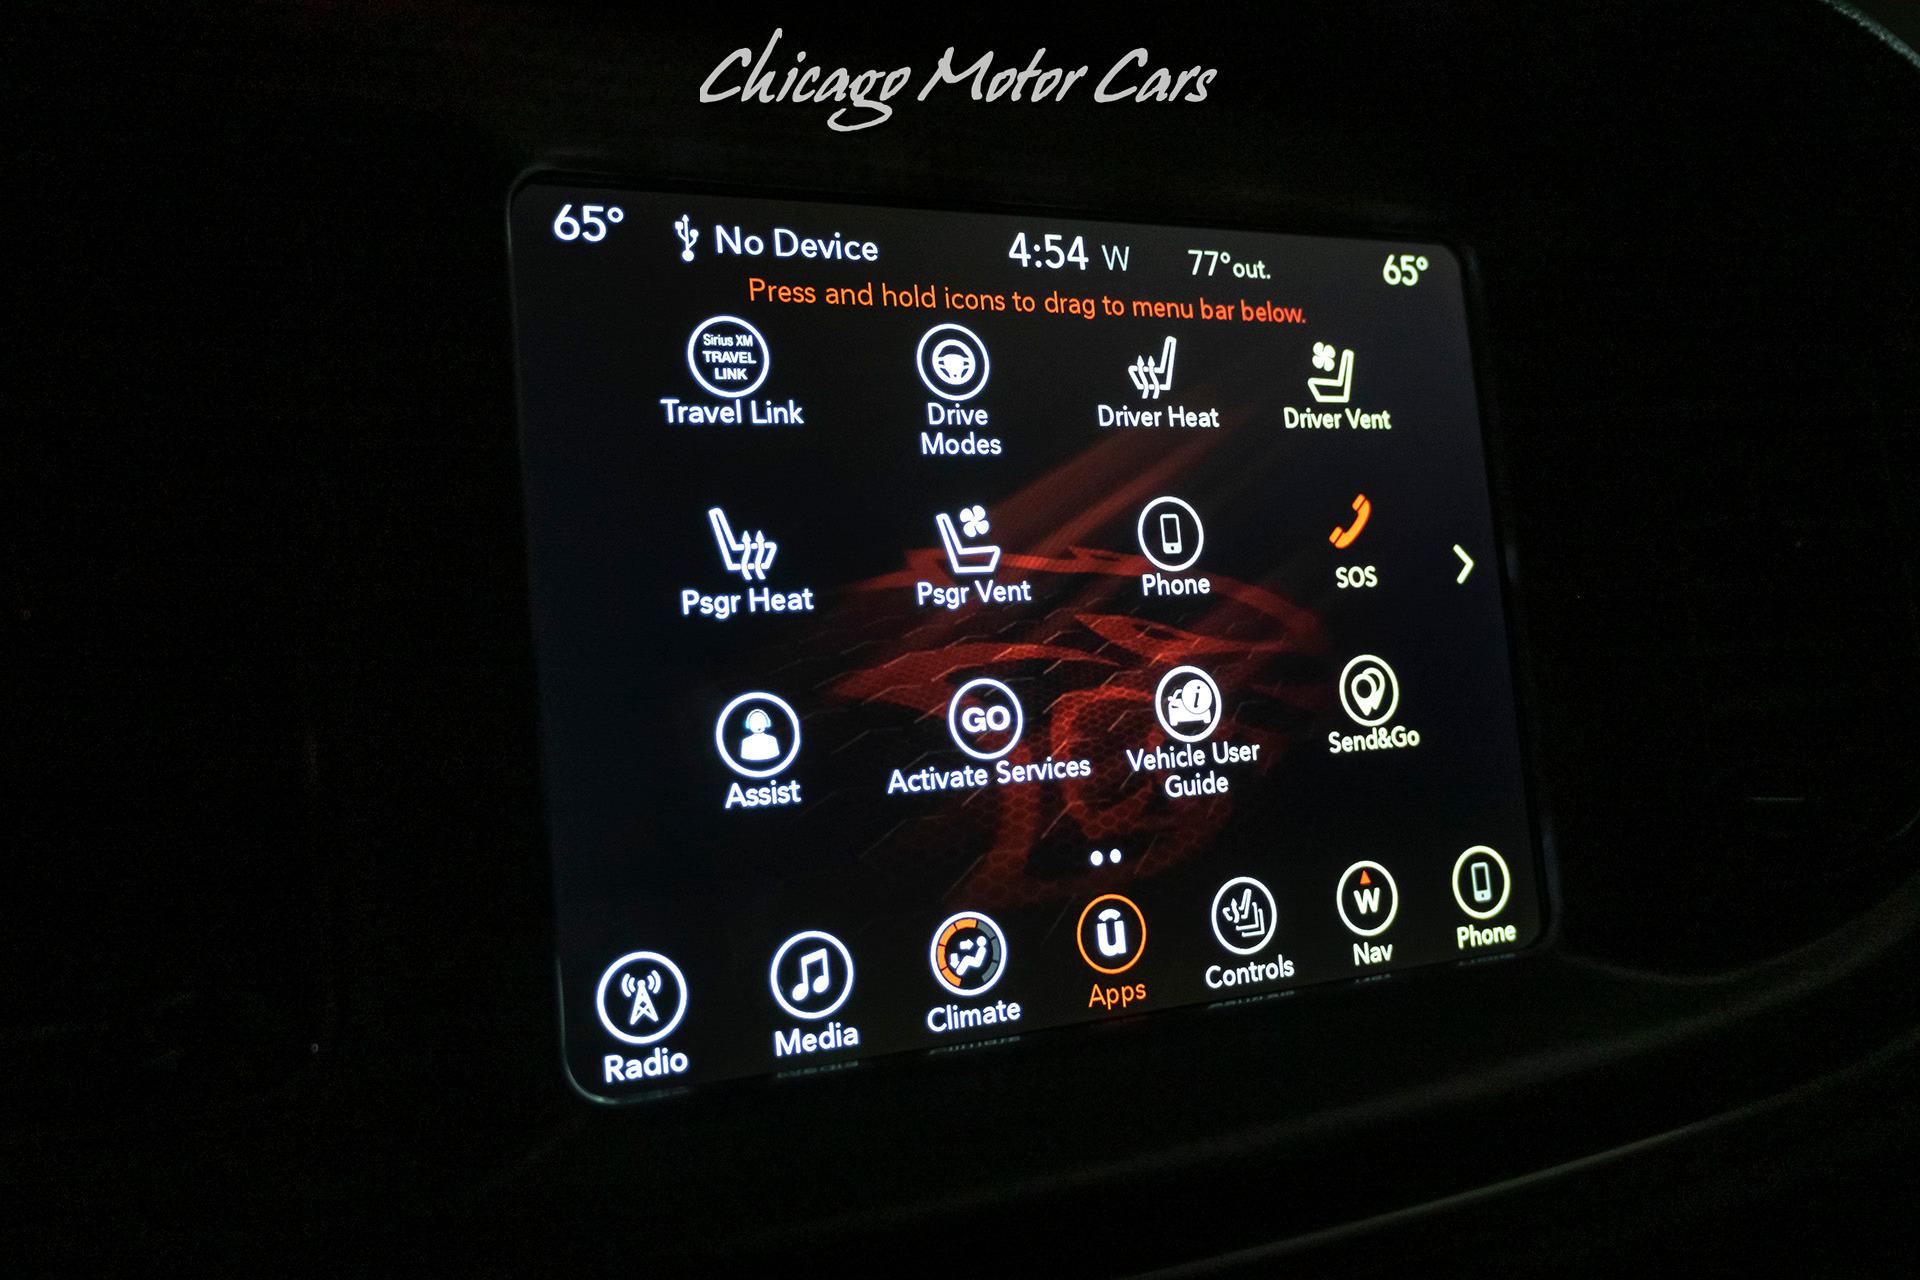 Used-2017-Dodge-Charger-SRT-Hellcat-Sedan-MSRP-71K-ONLY-10K-MILES-707-HP